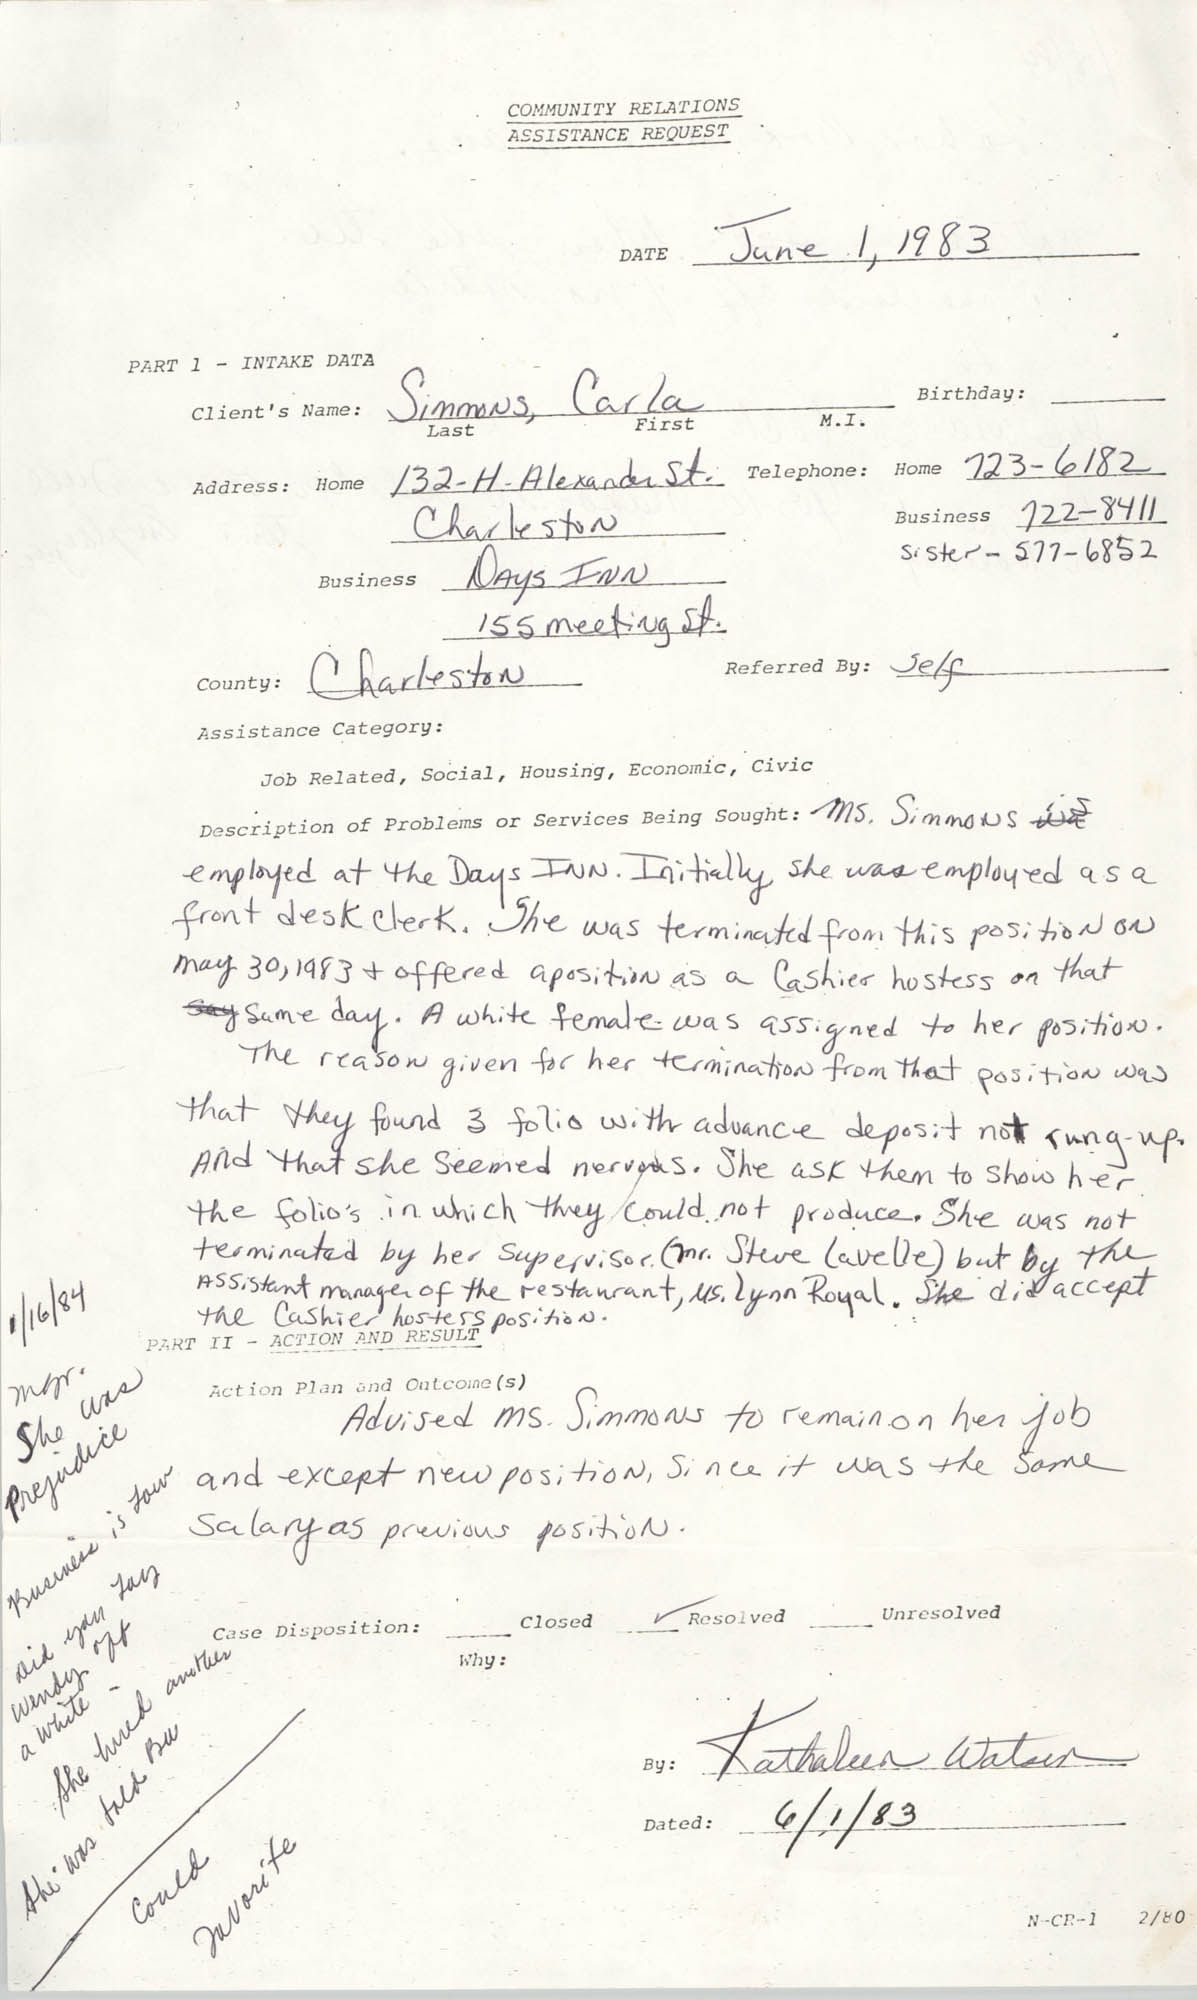 Community Relations Assistance Request, June 1, 1983